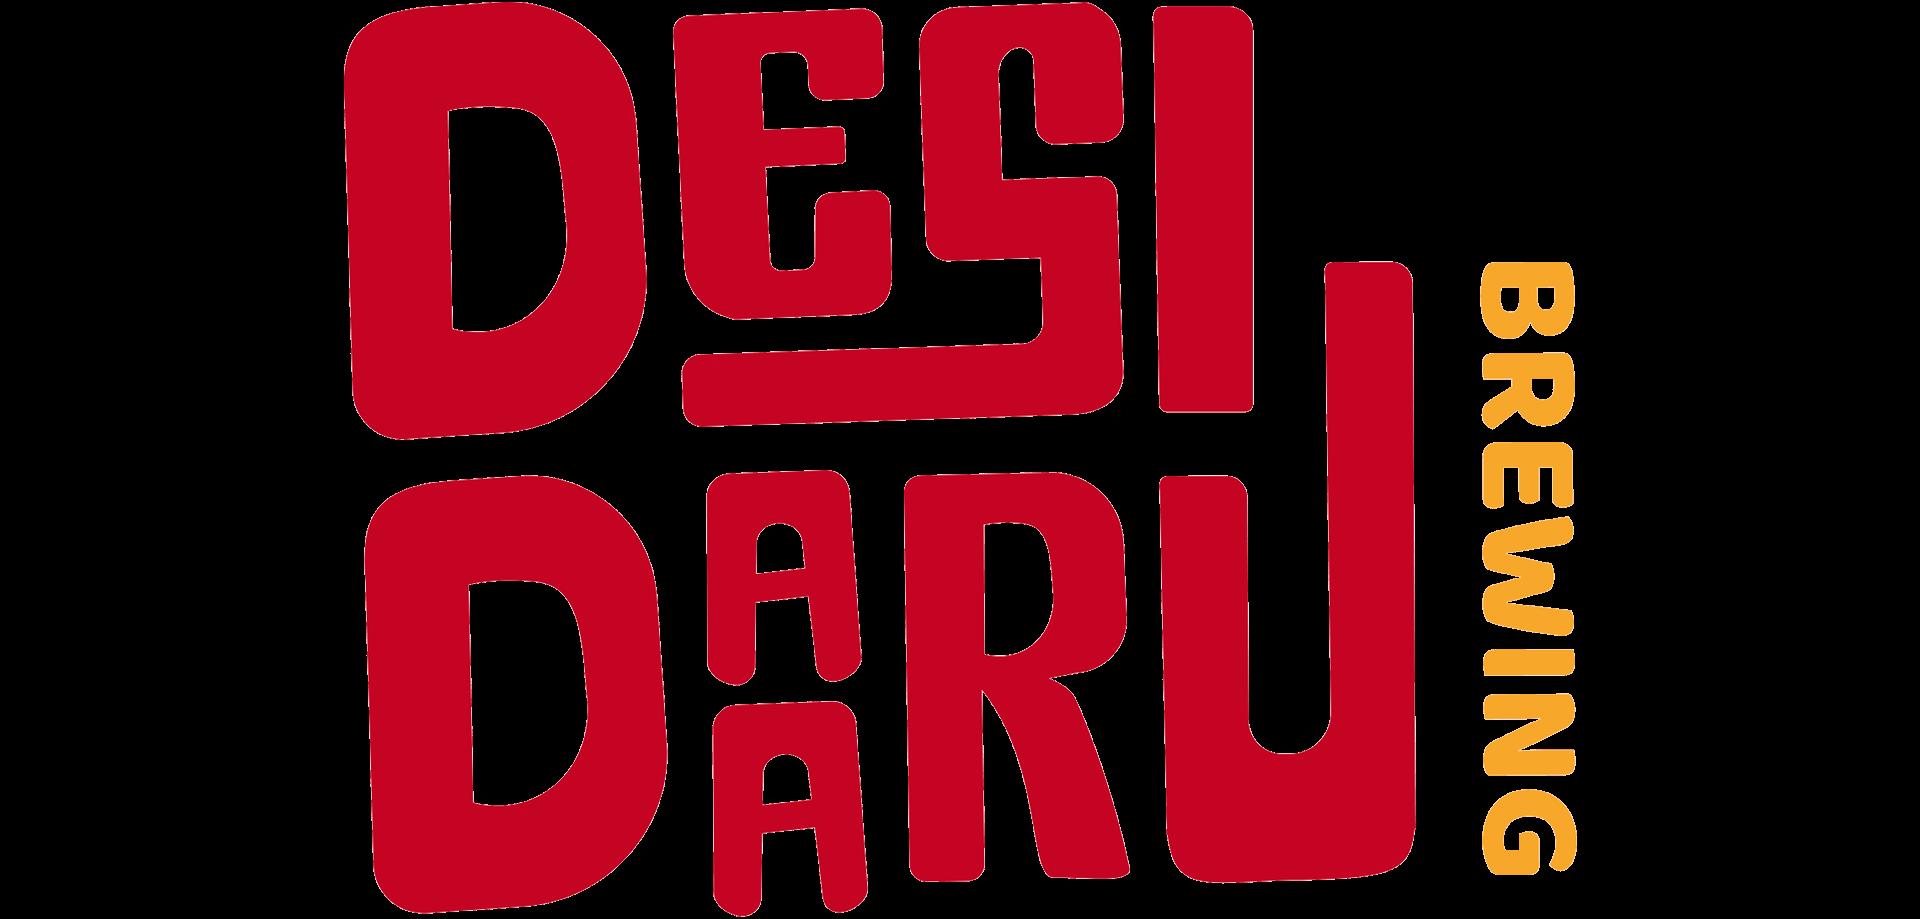 Desi Daaru brewing logo design in colour